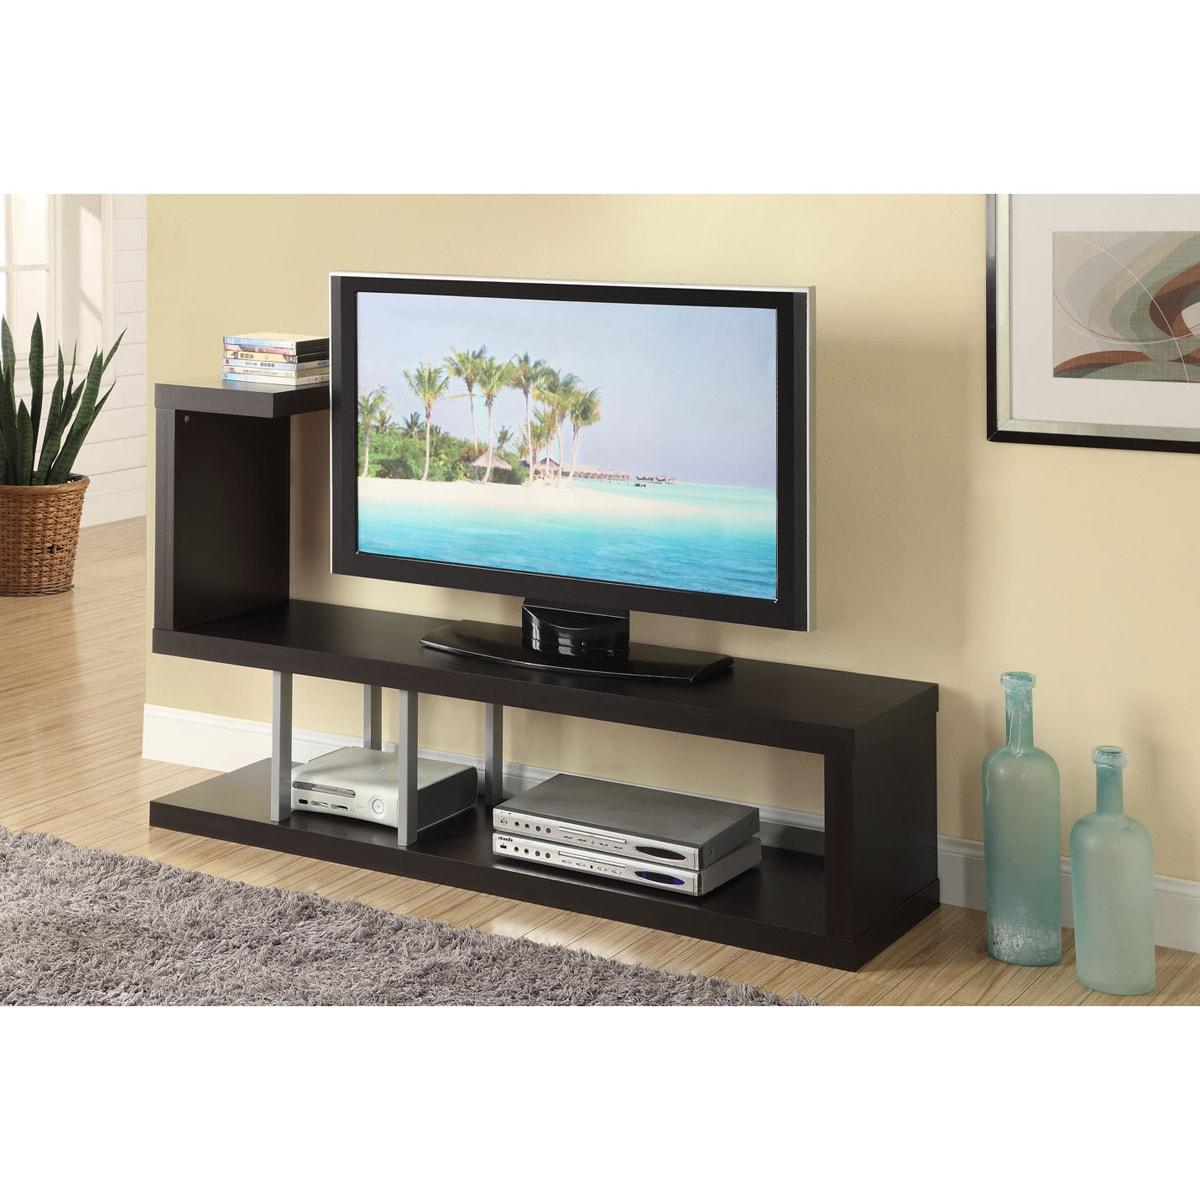 Hollow core Cappuccino TV Console Free Shipping